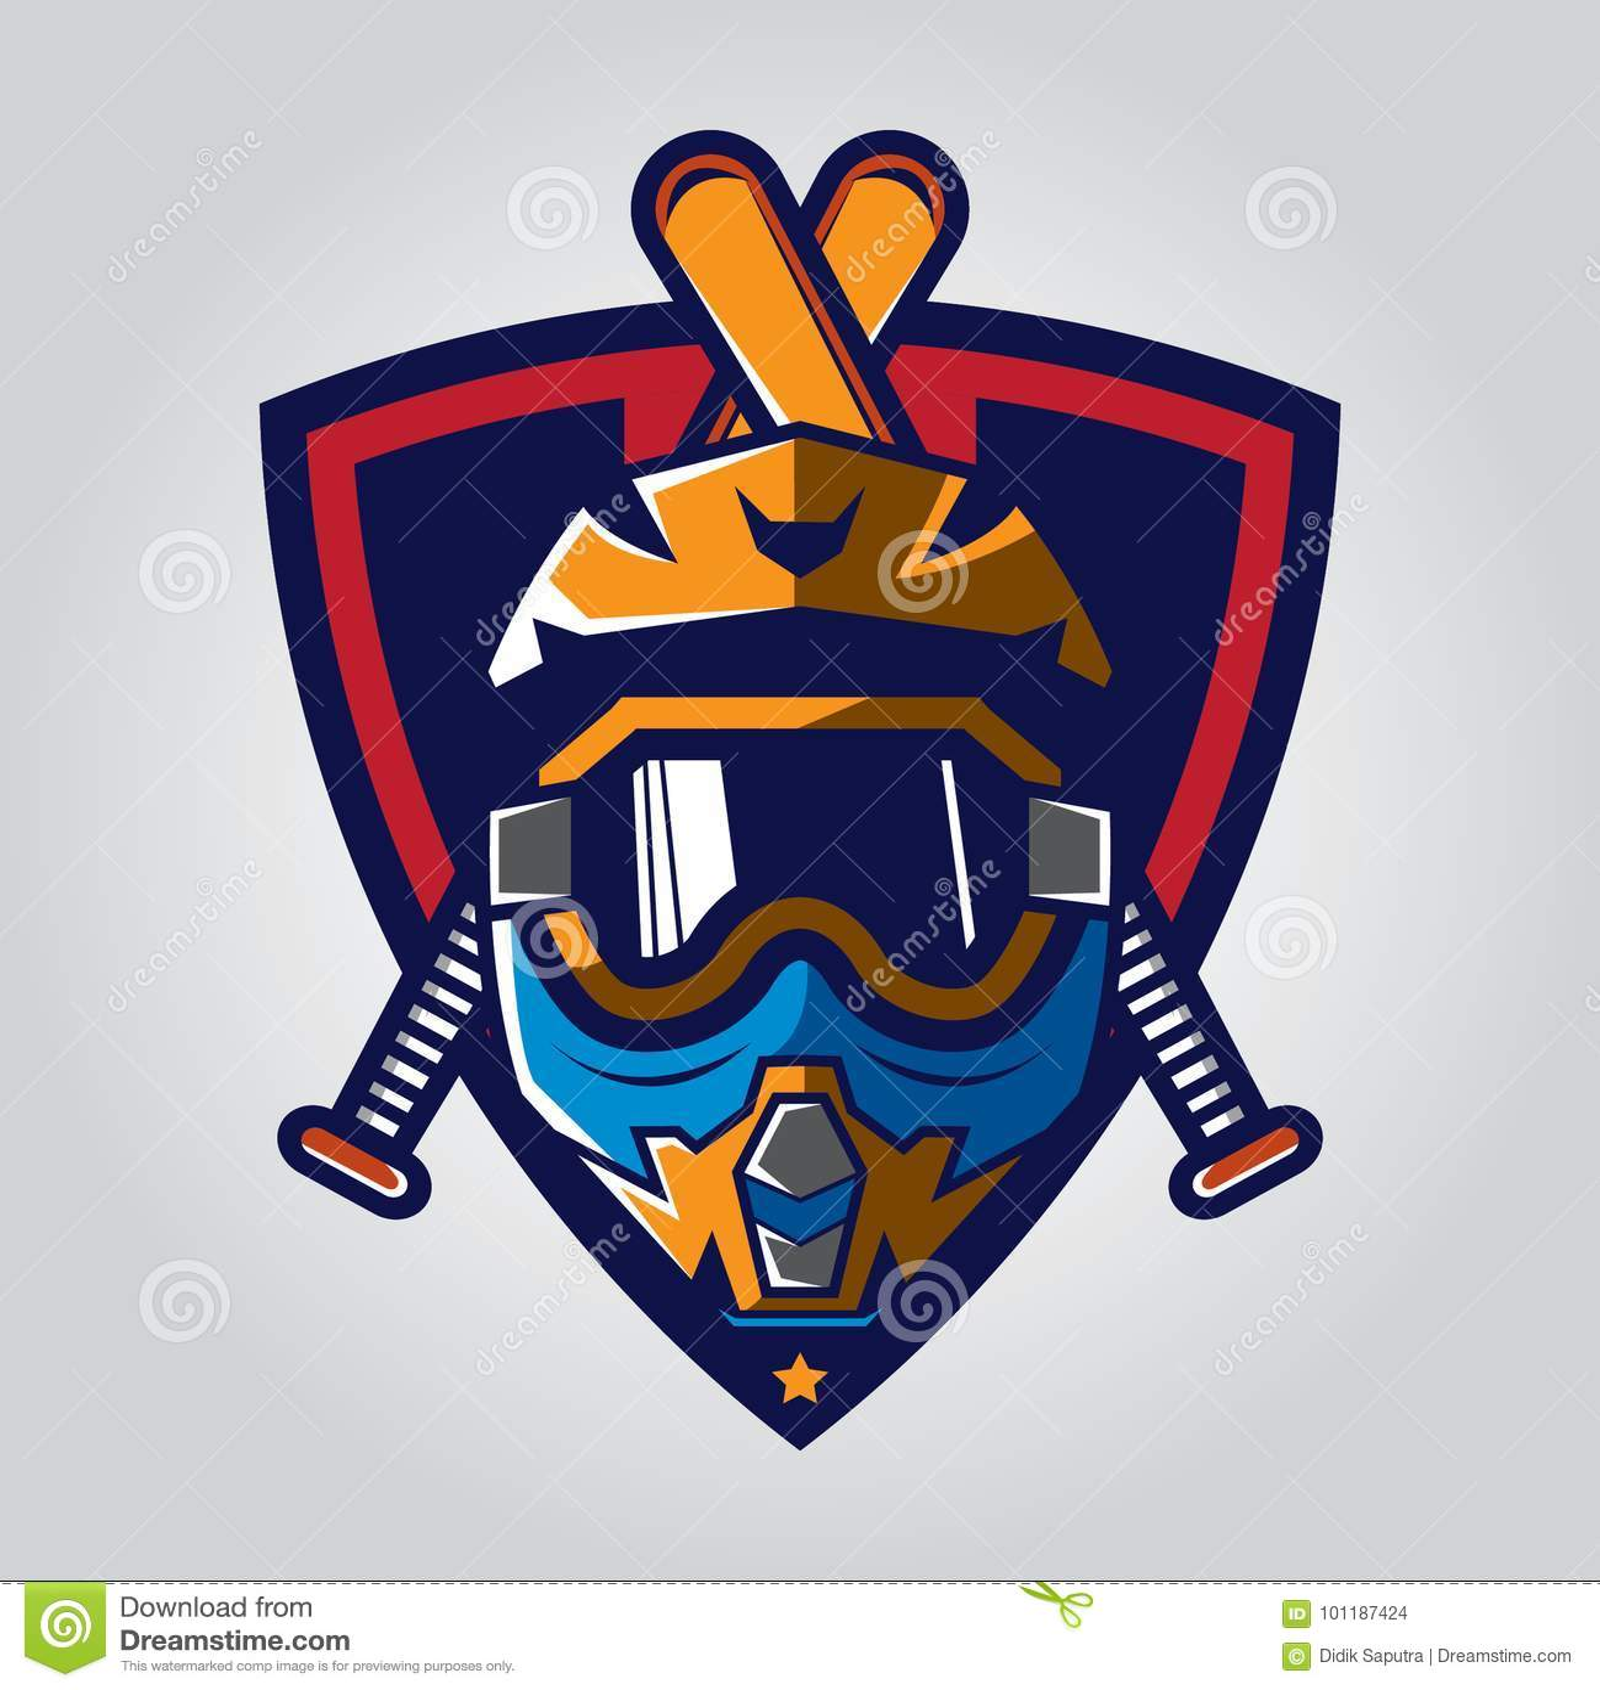 Motocross Helmet Badge Stock Vector Illustration Of Emblem